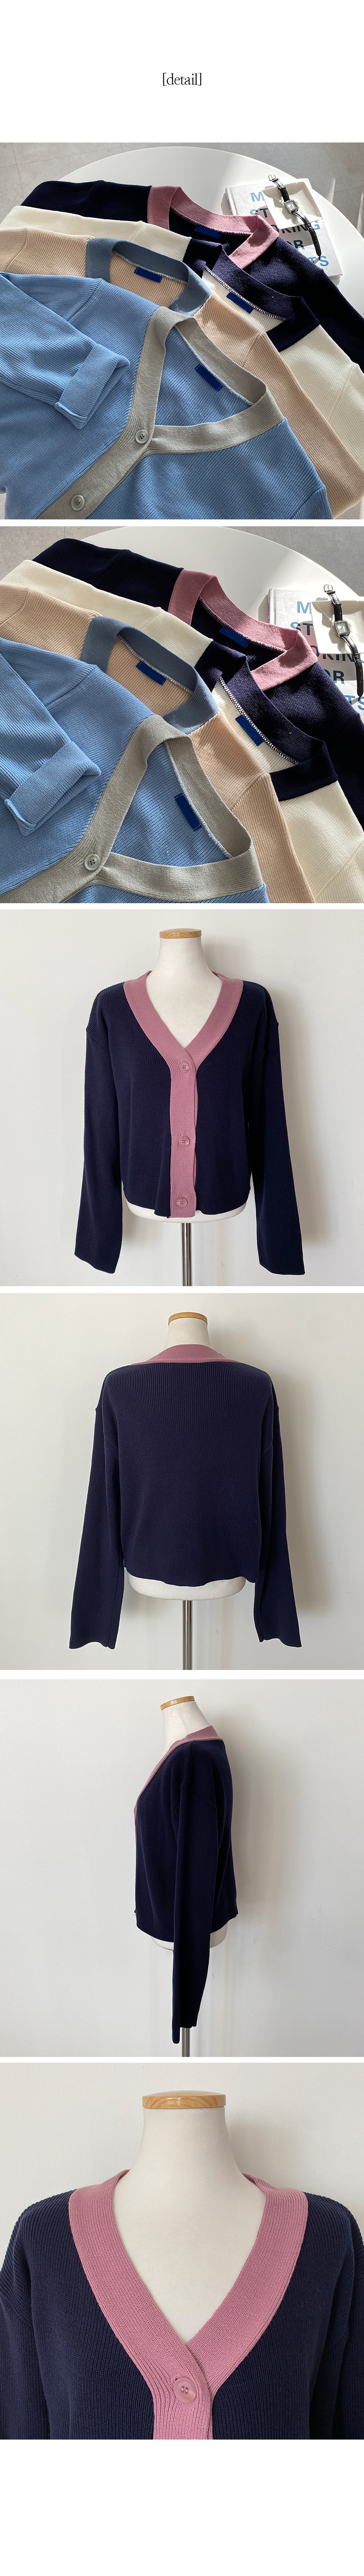 Mods color cardigan